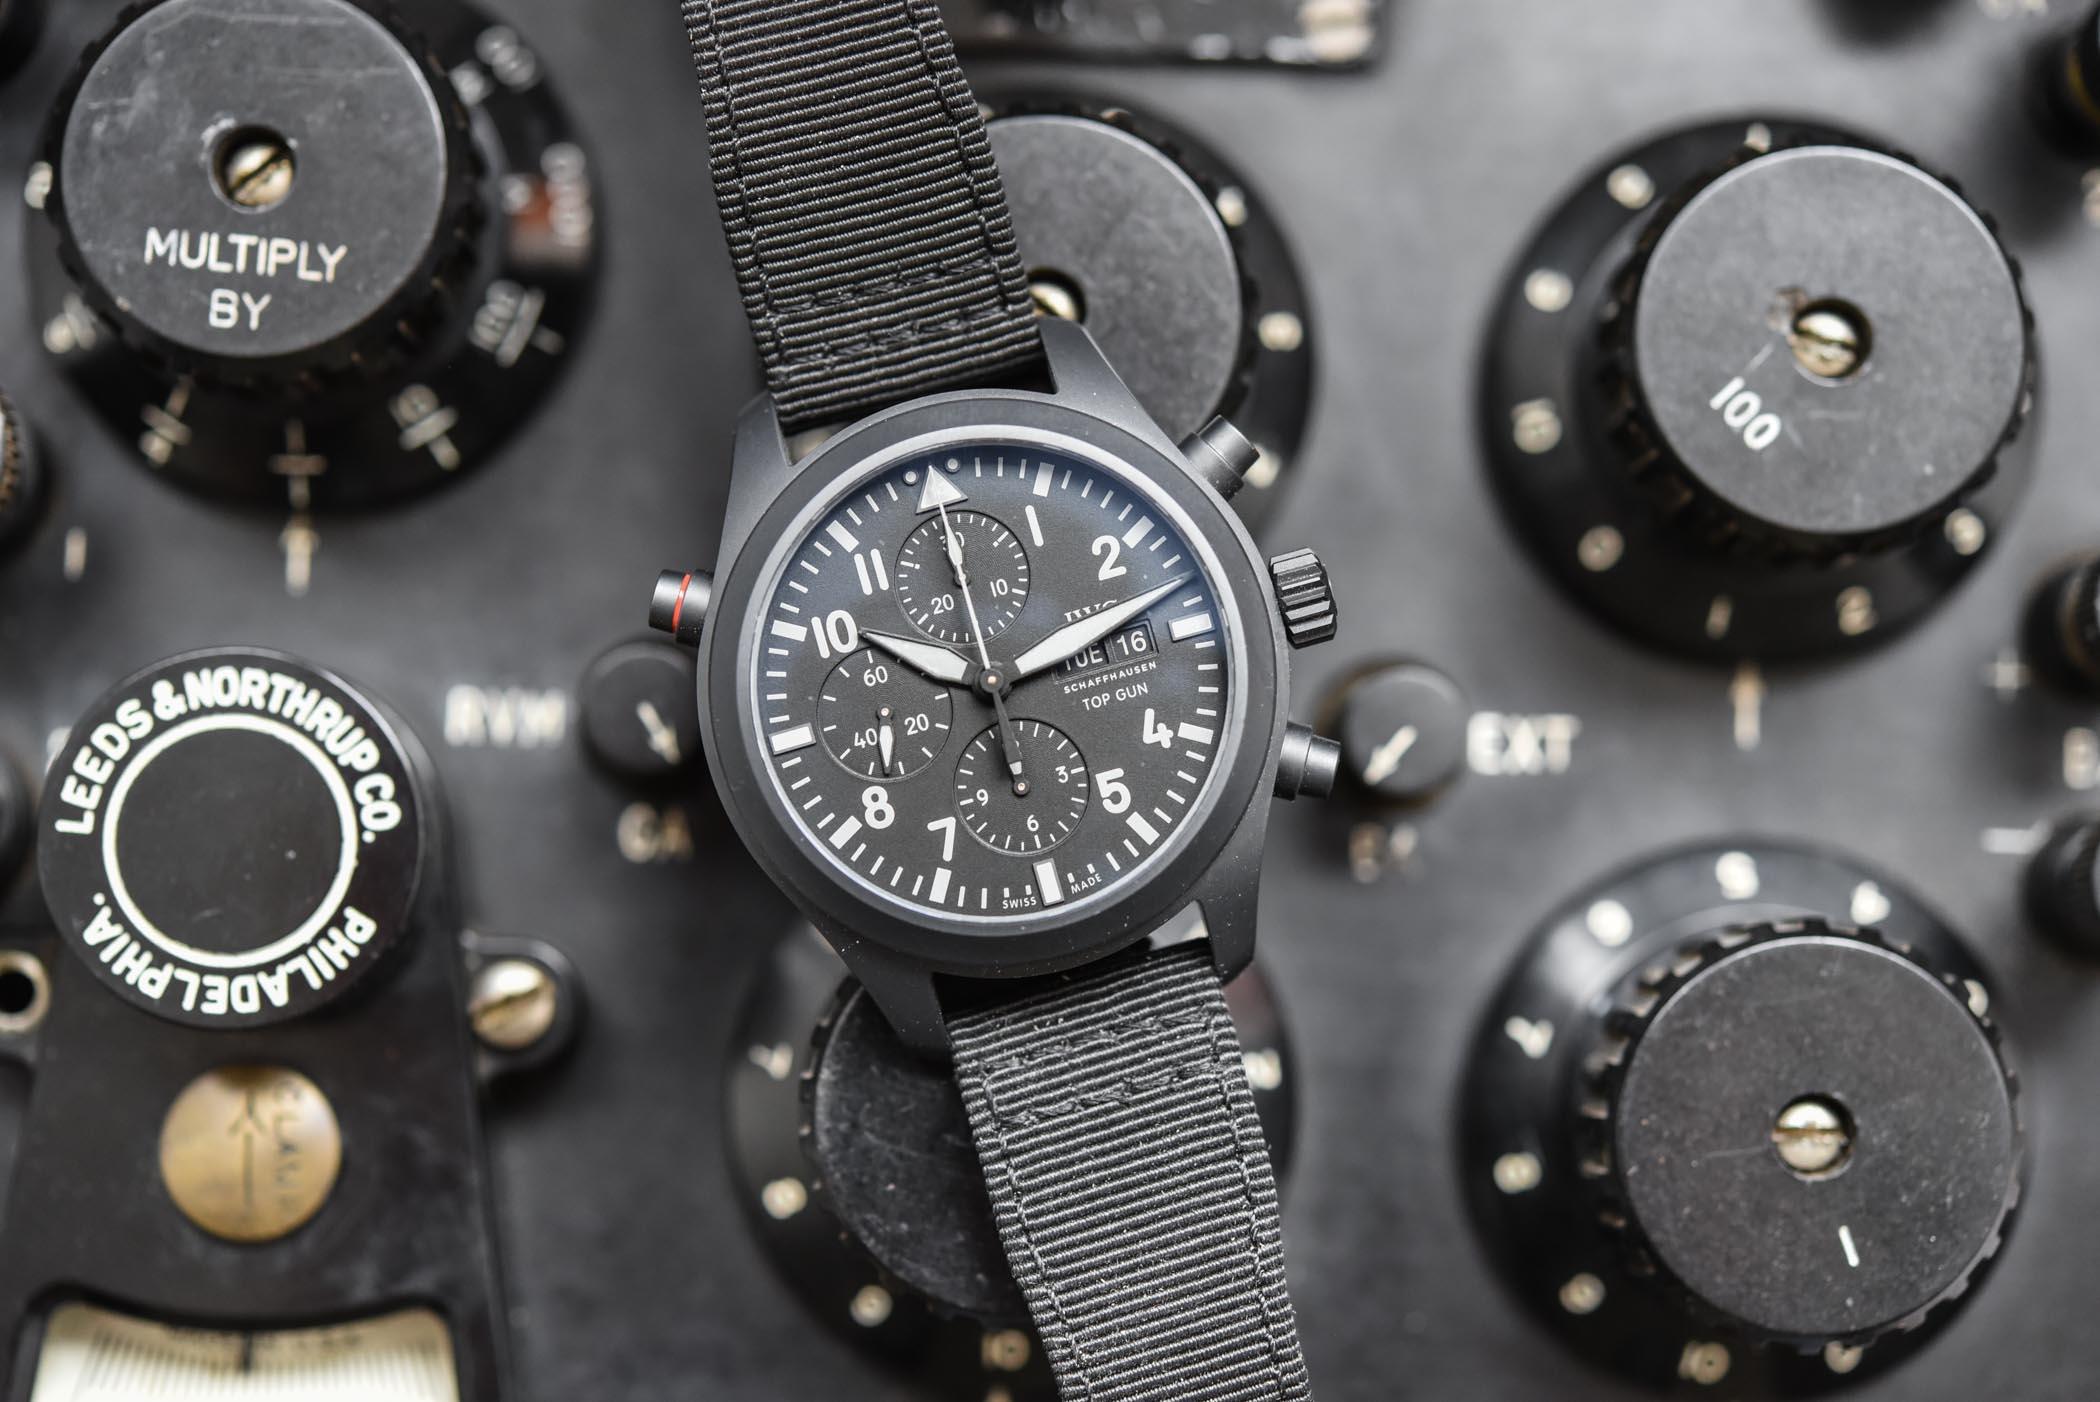 IWC Pilot's Watch Double Chronograph TOP GUN Ceratanium IW371815